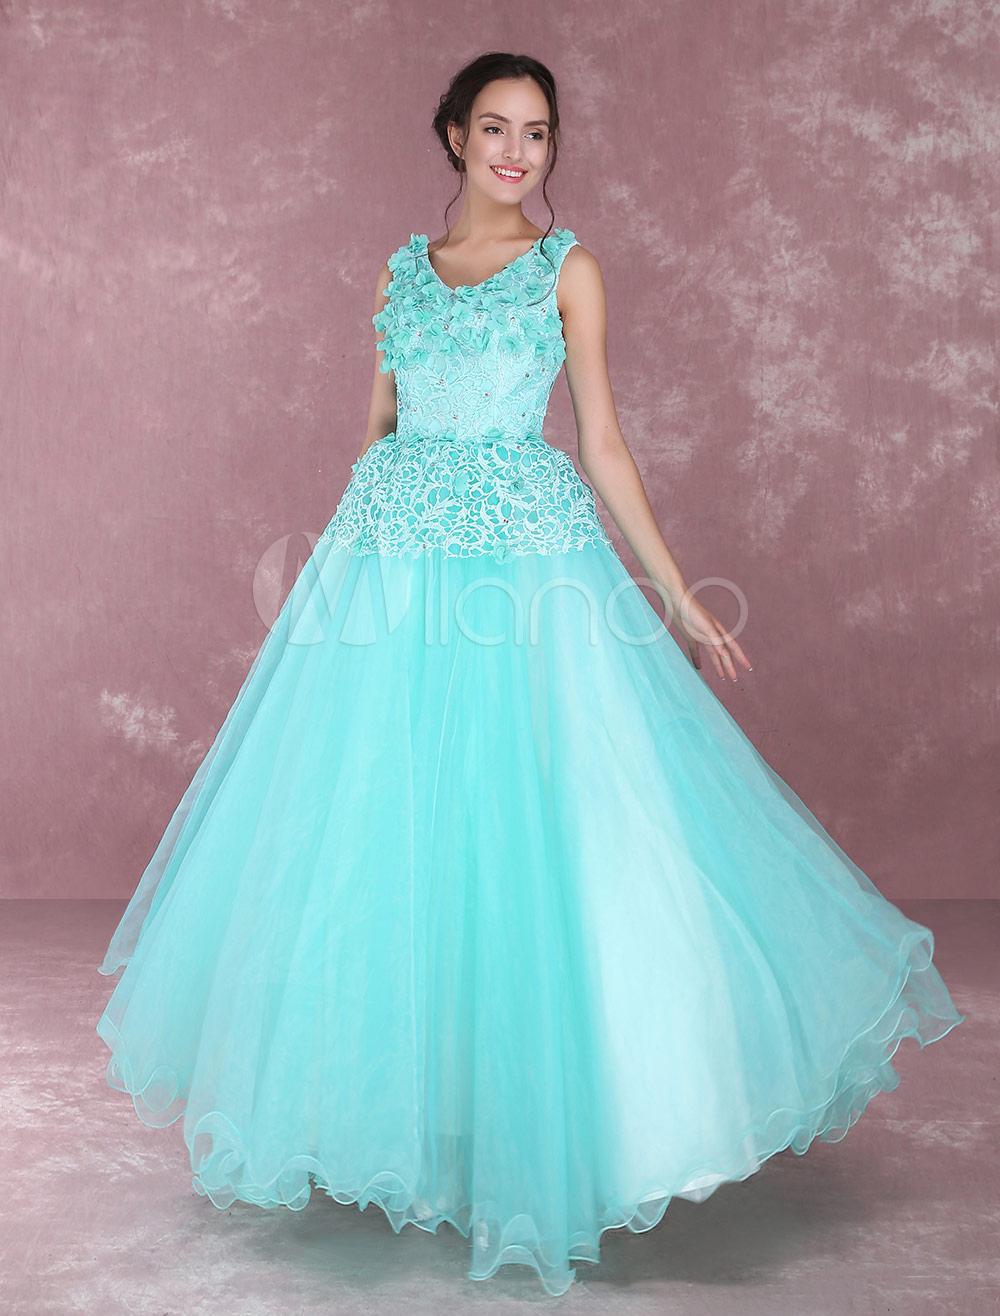 Turquoise Quinceanera Dresses Tulle 3D Flowers V Neck Floor Length Princess Pageant Dresses